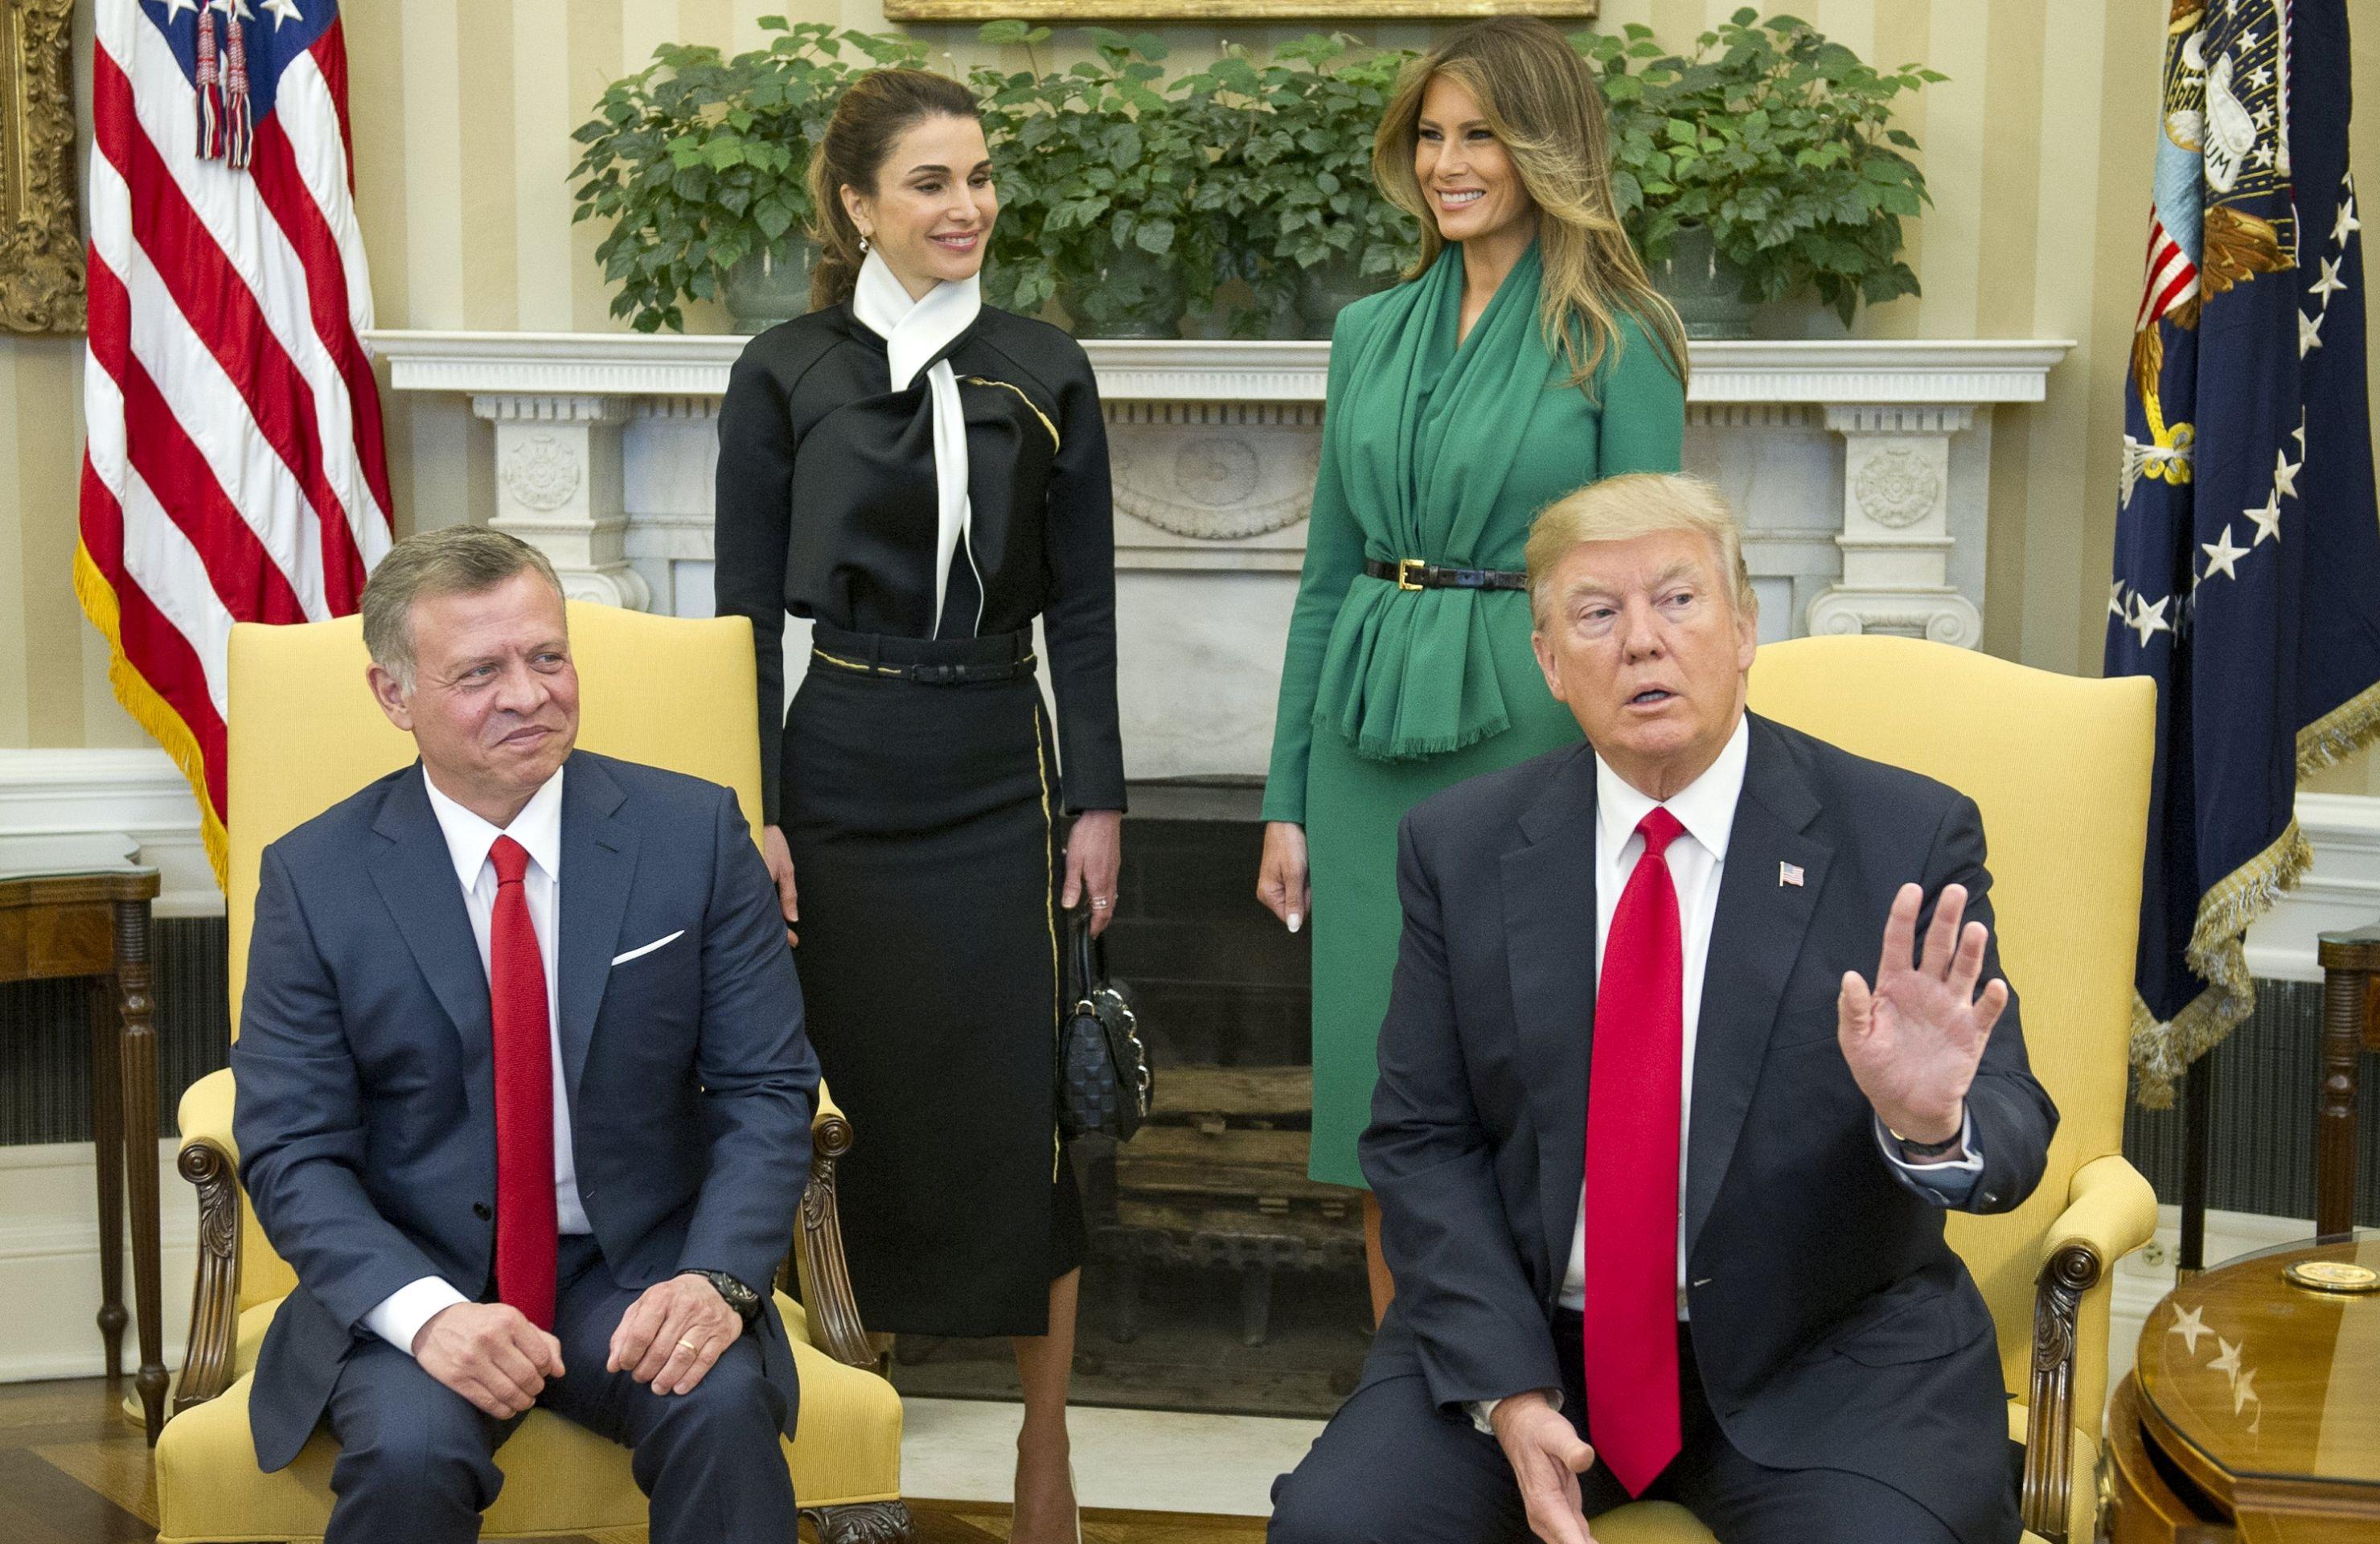 Jordanski kralj Abdullah pozdravlja Trumpovu hrabrost u postizanju izraelsko-palestinskog rješenja